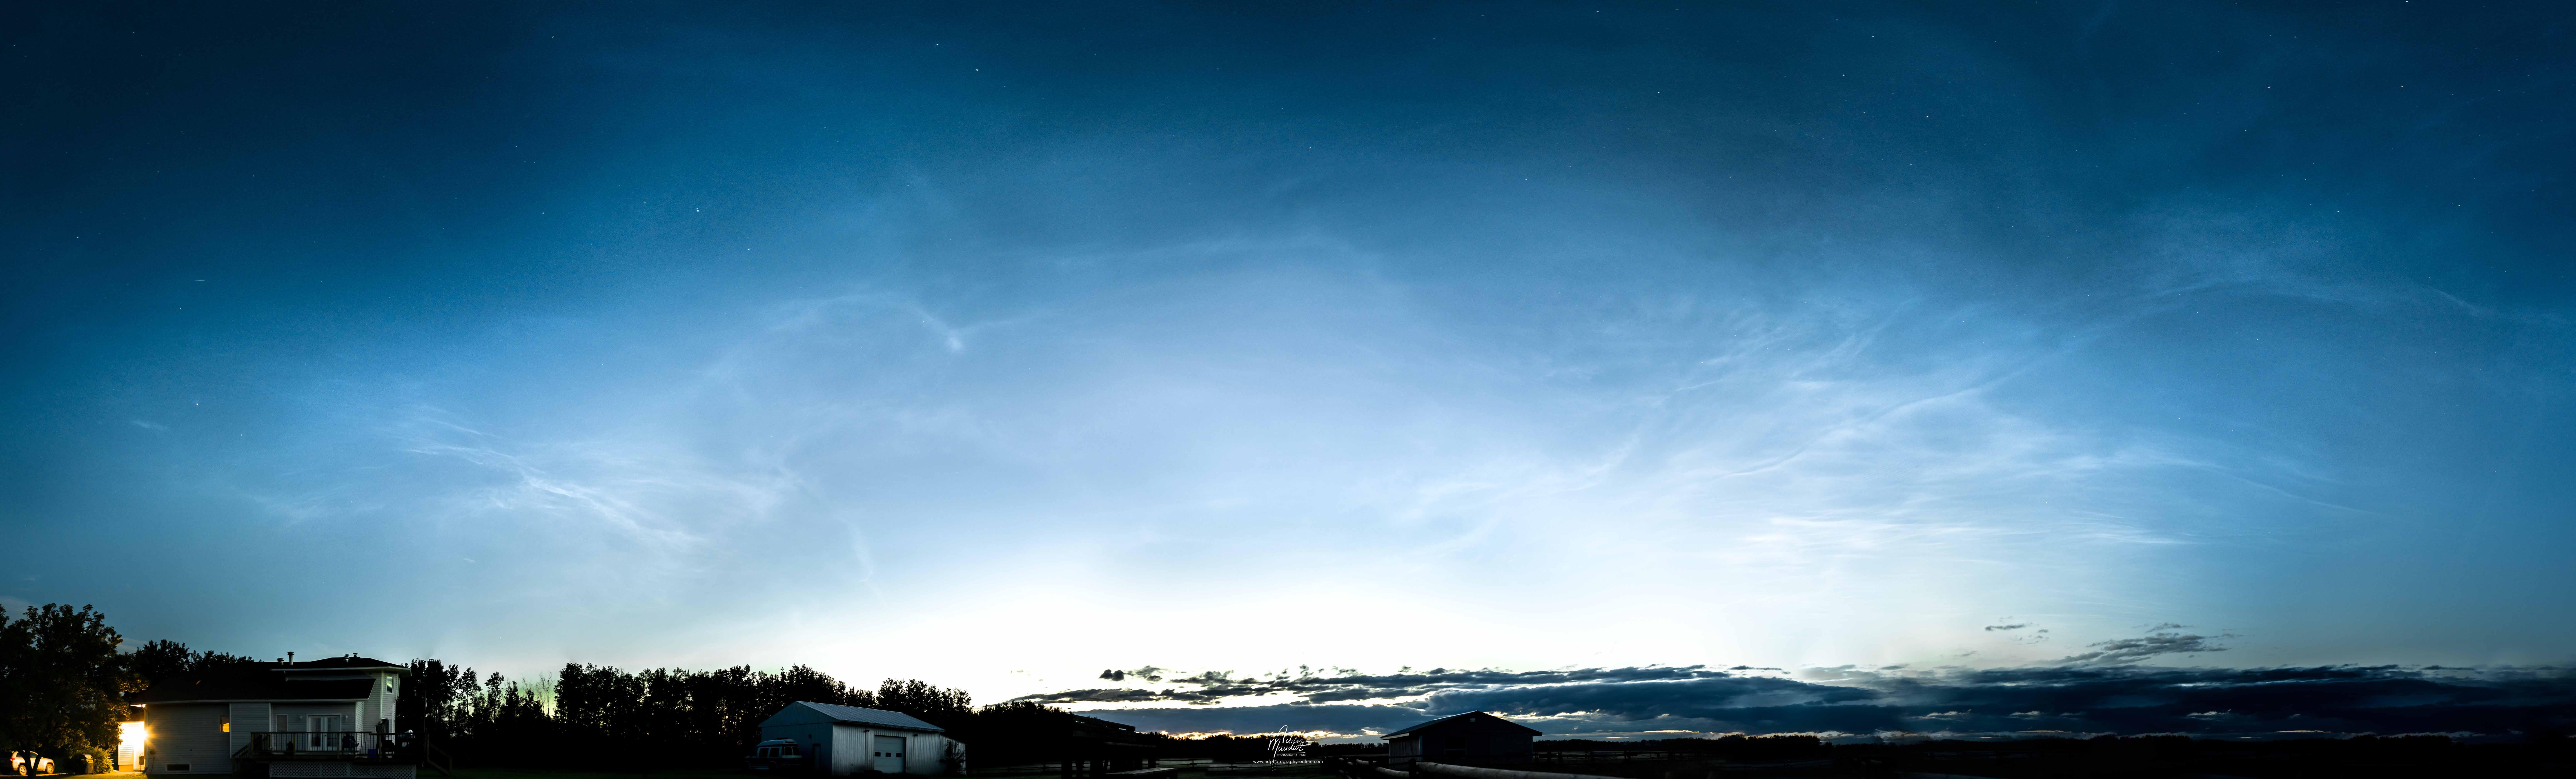 dsc09642-panorama-2-2-copy.jpg